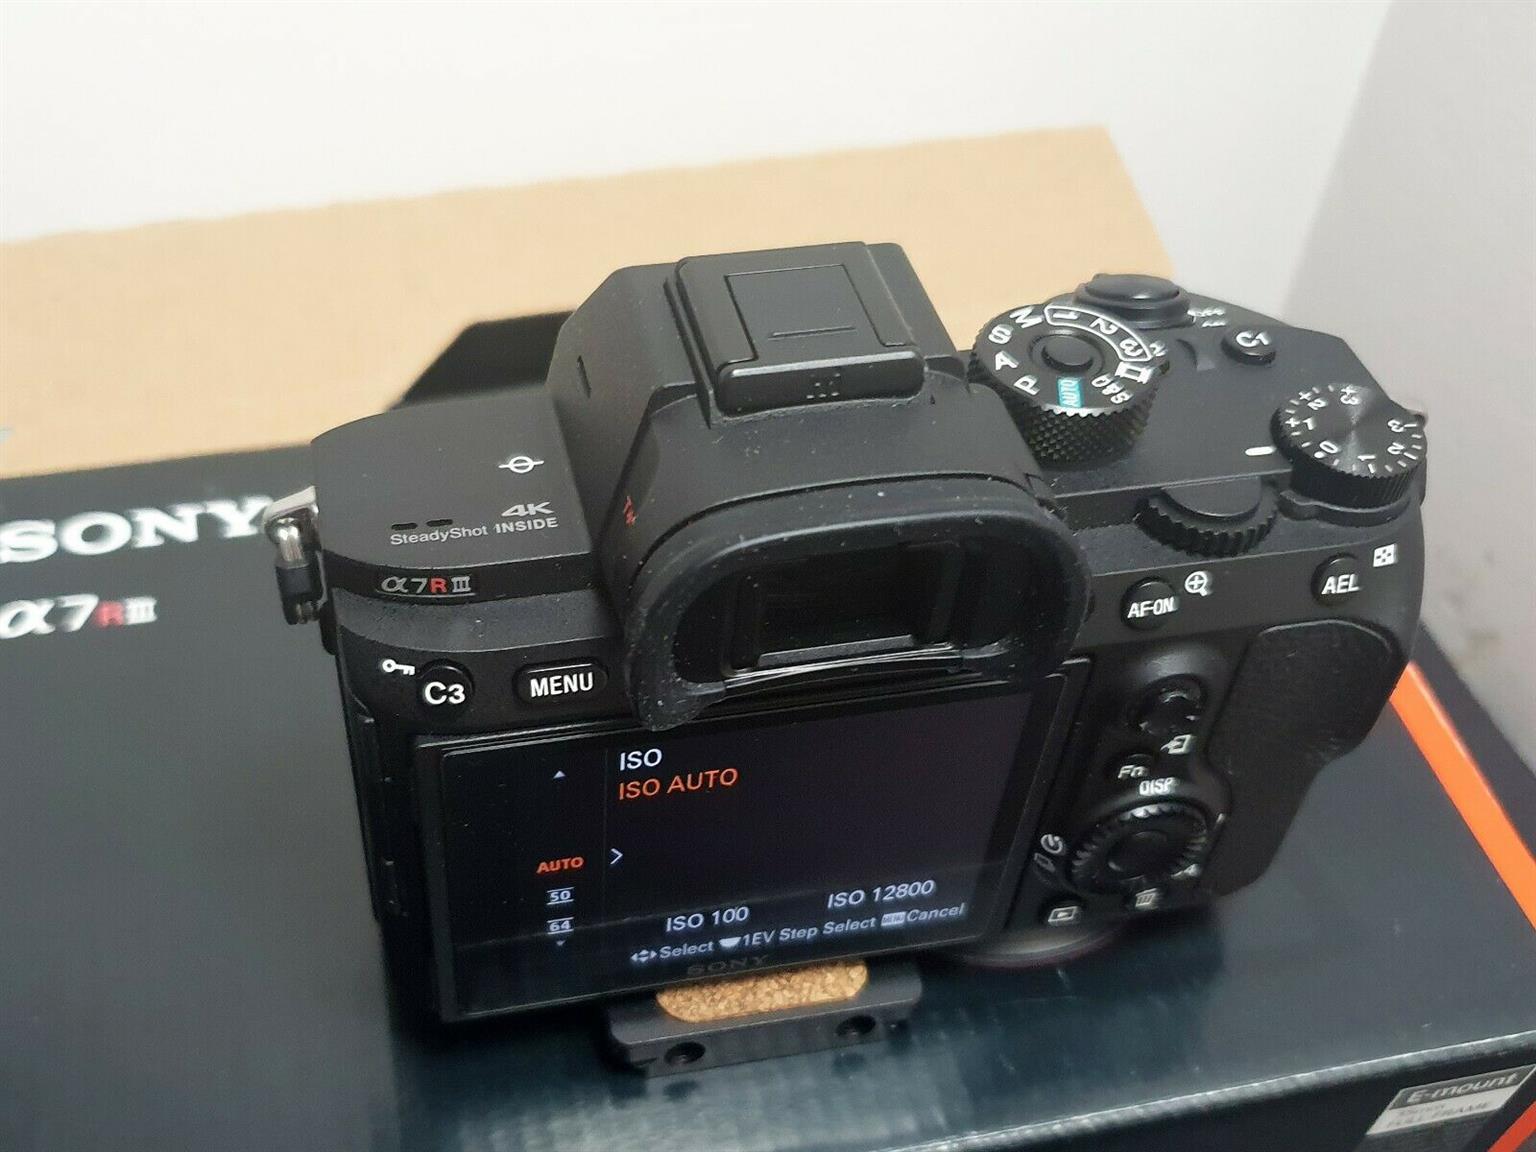 Sony Alpha A7 Riii body only Kit